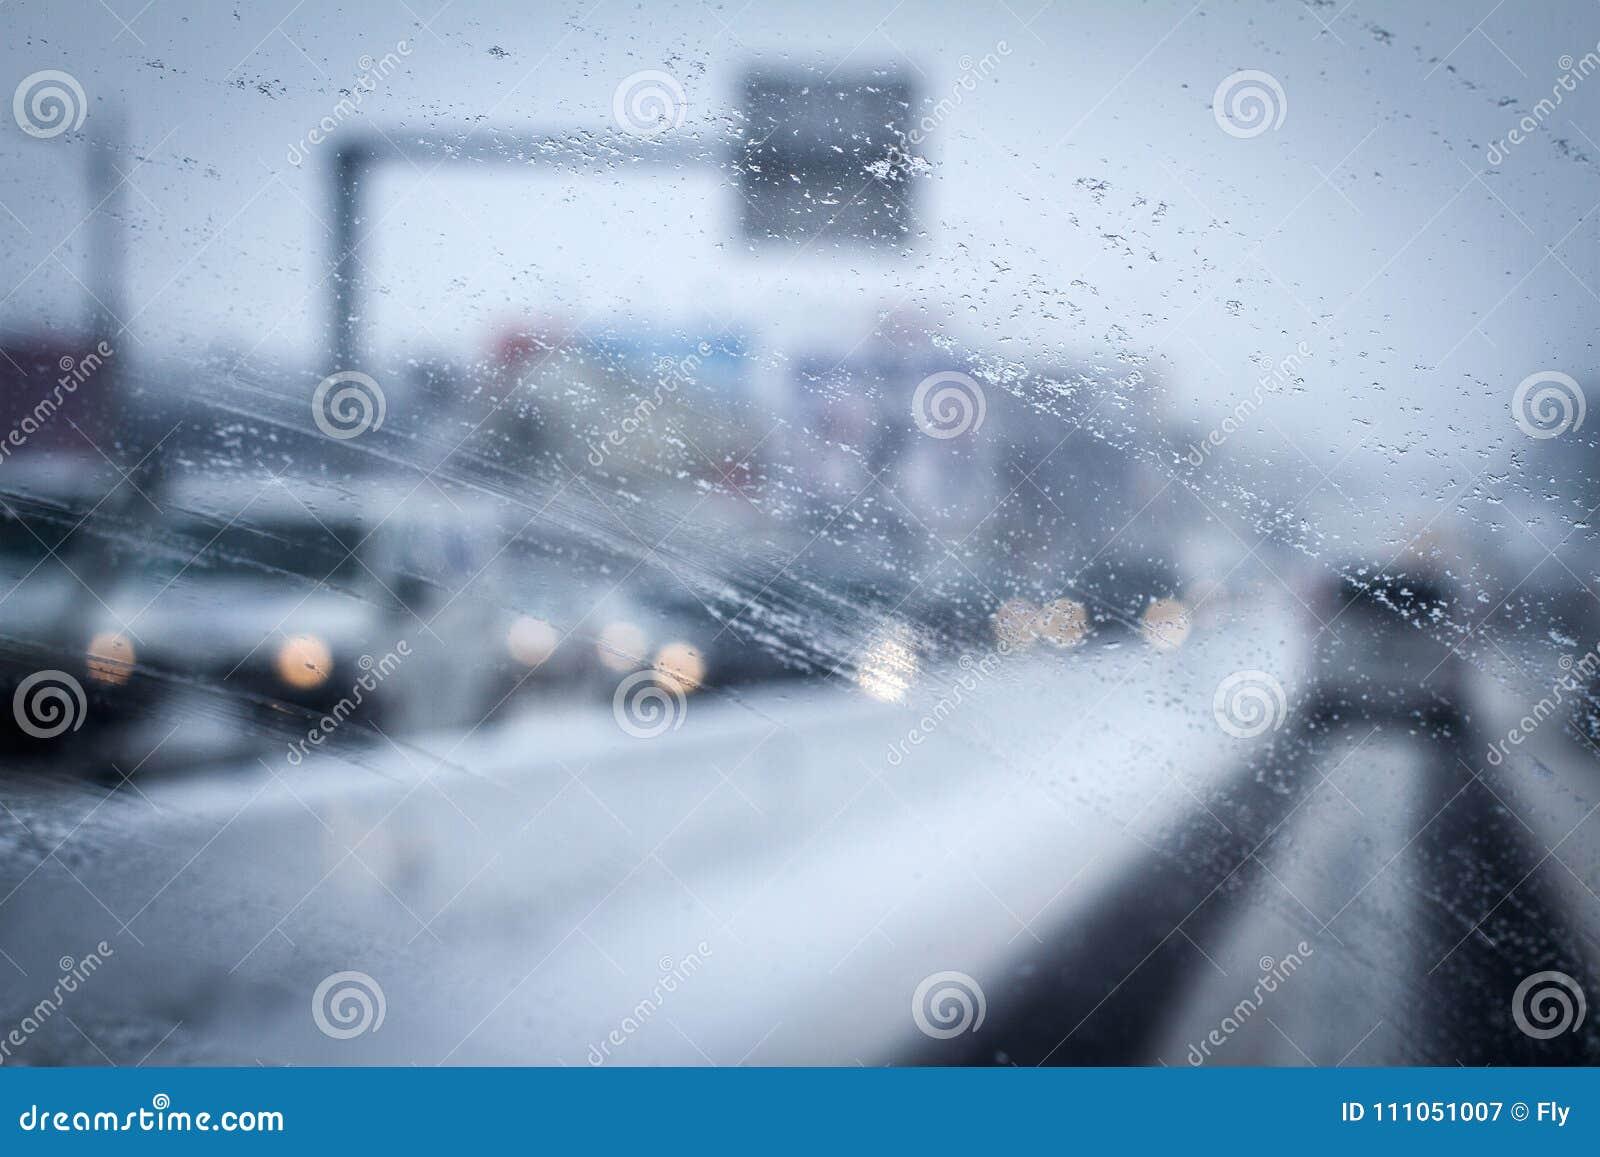 Closeup of rain drops drizzle on car windshield